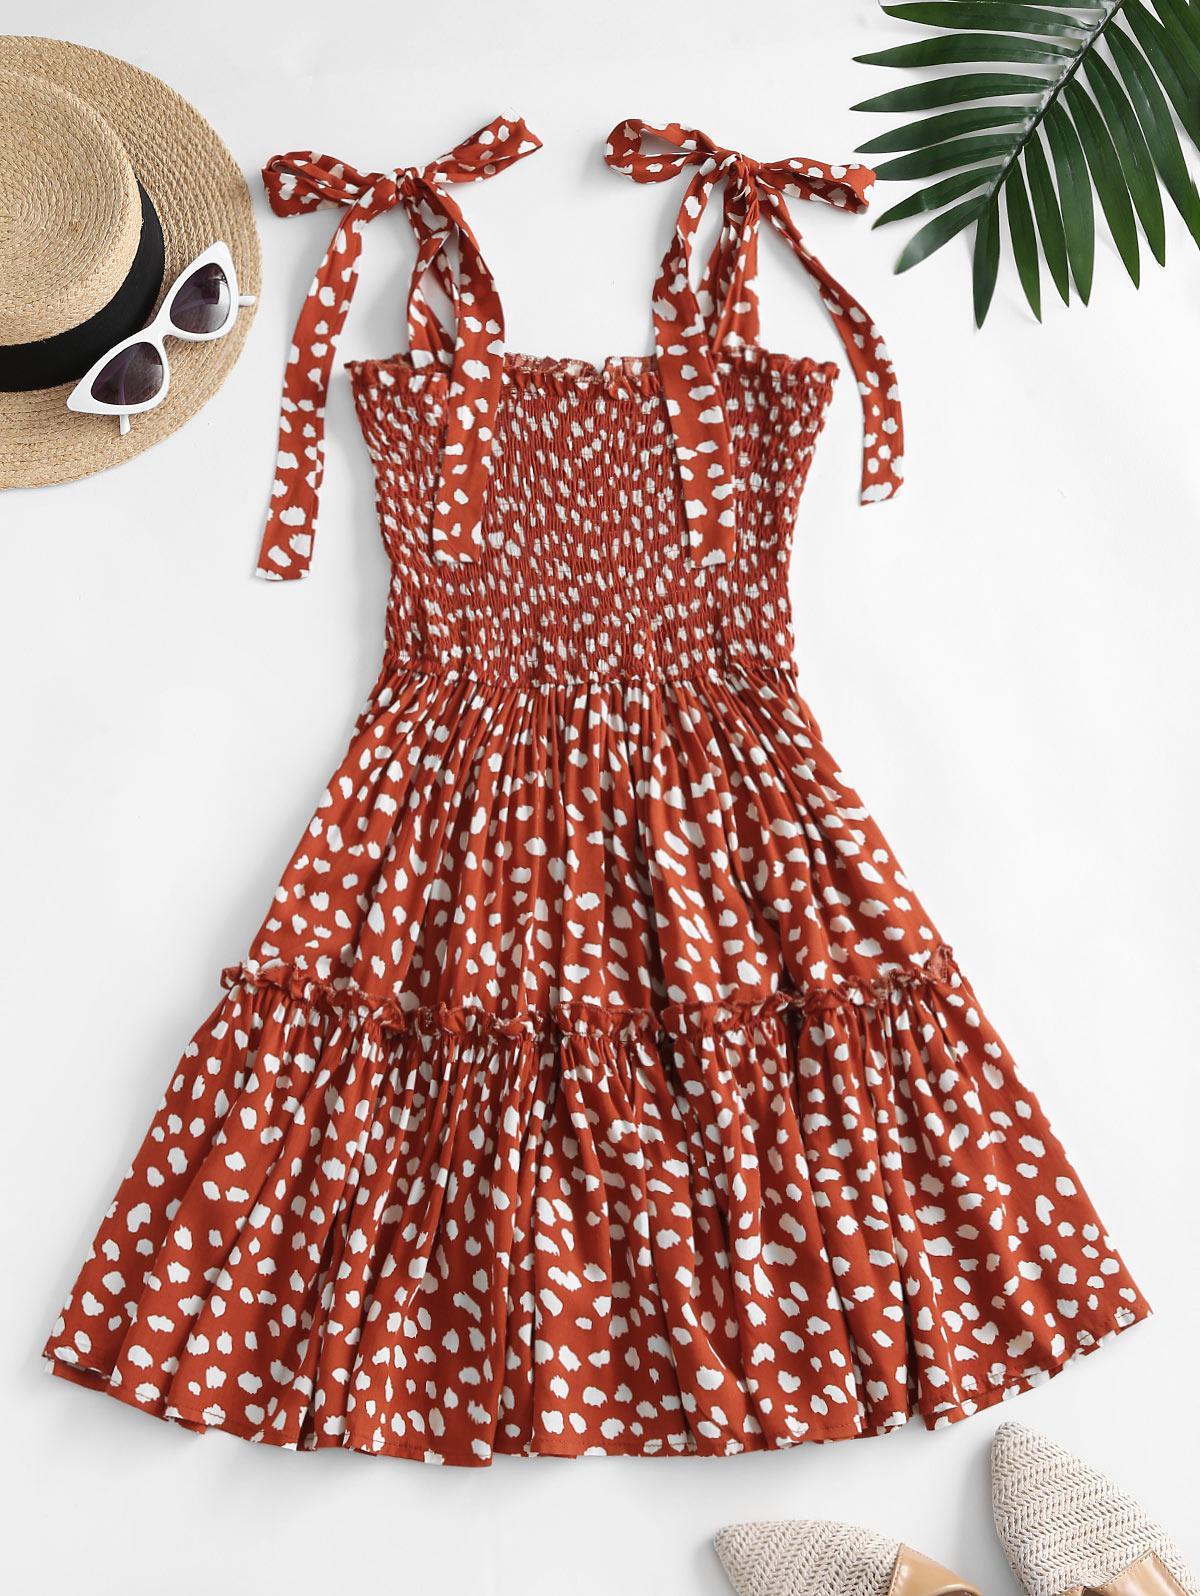 Leopard Tie Shoulder Smocked Tiered Dress